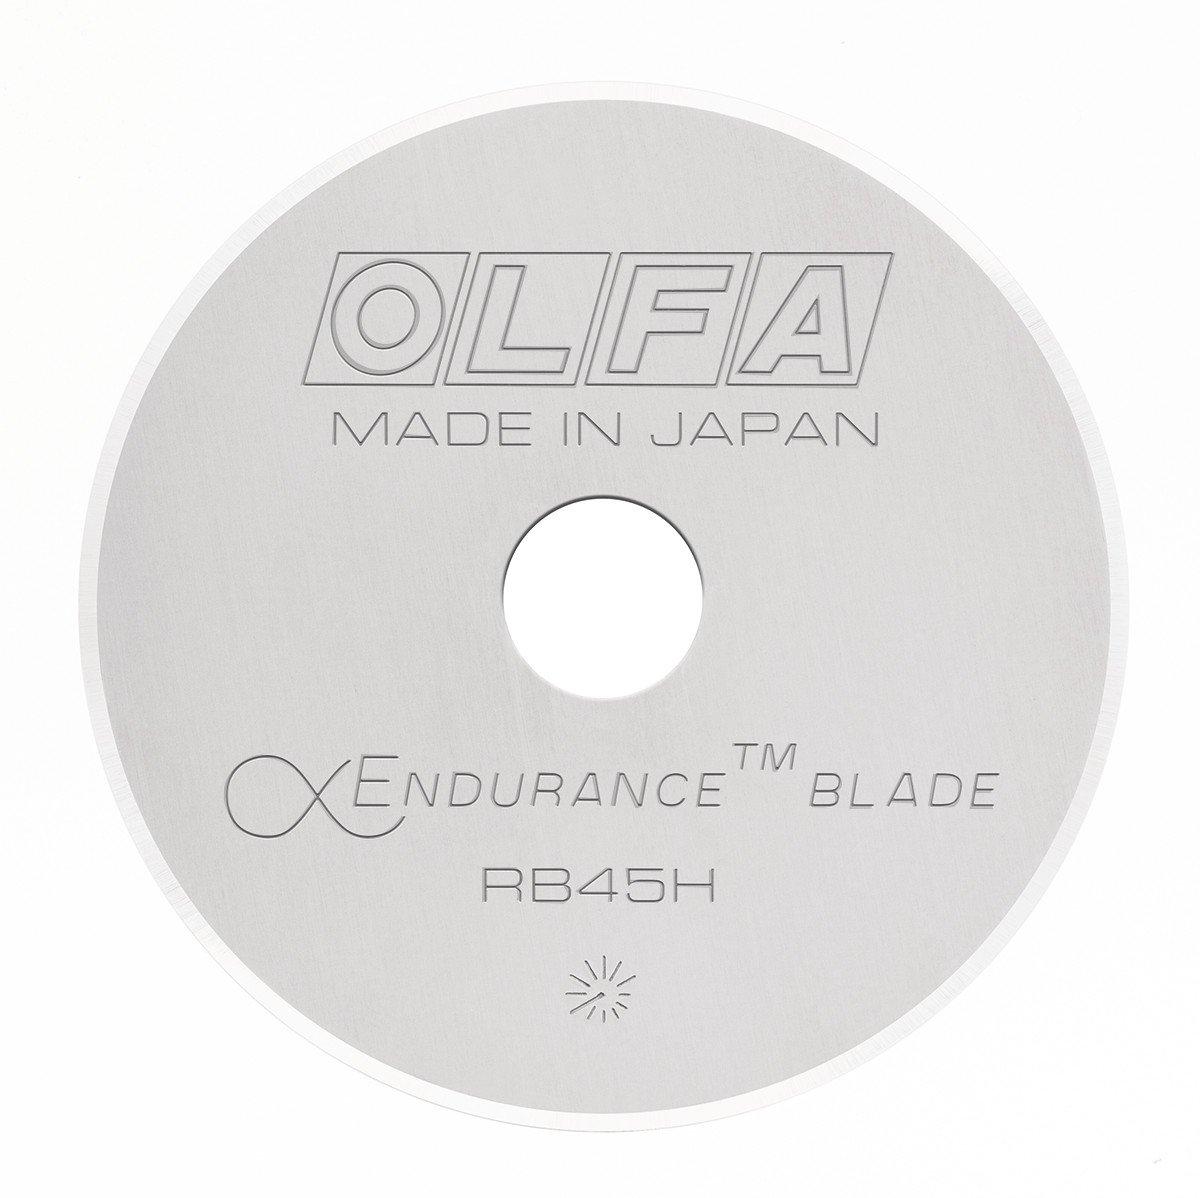 Olfa Rotary Endurance Refill Blades 45mm X1 ENDURANCE BLADE RB45H-1  1128127